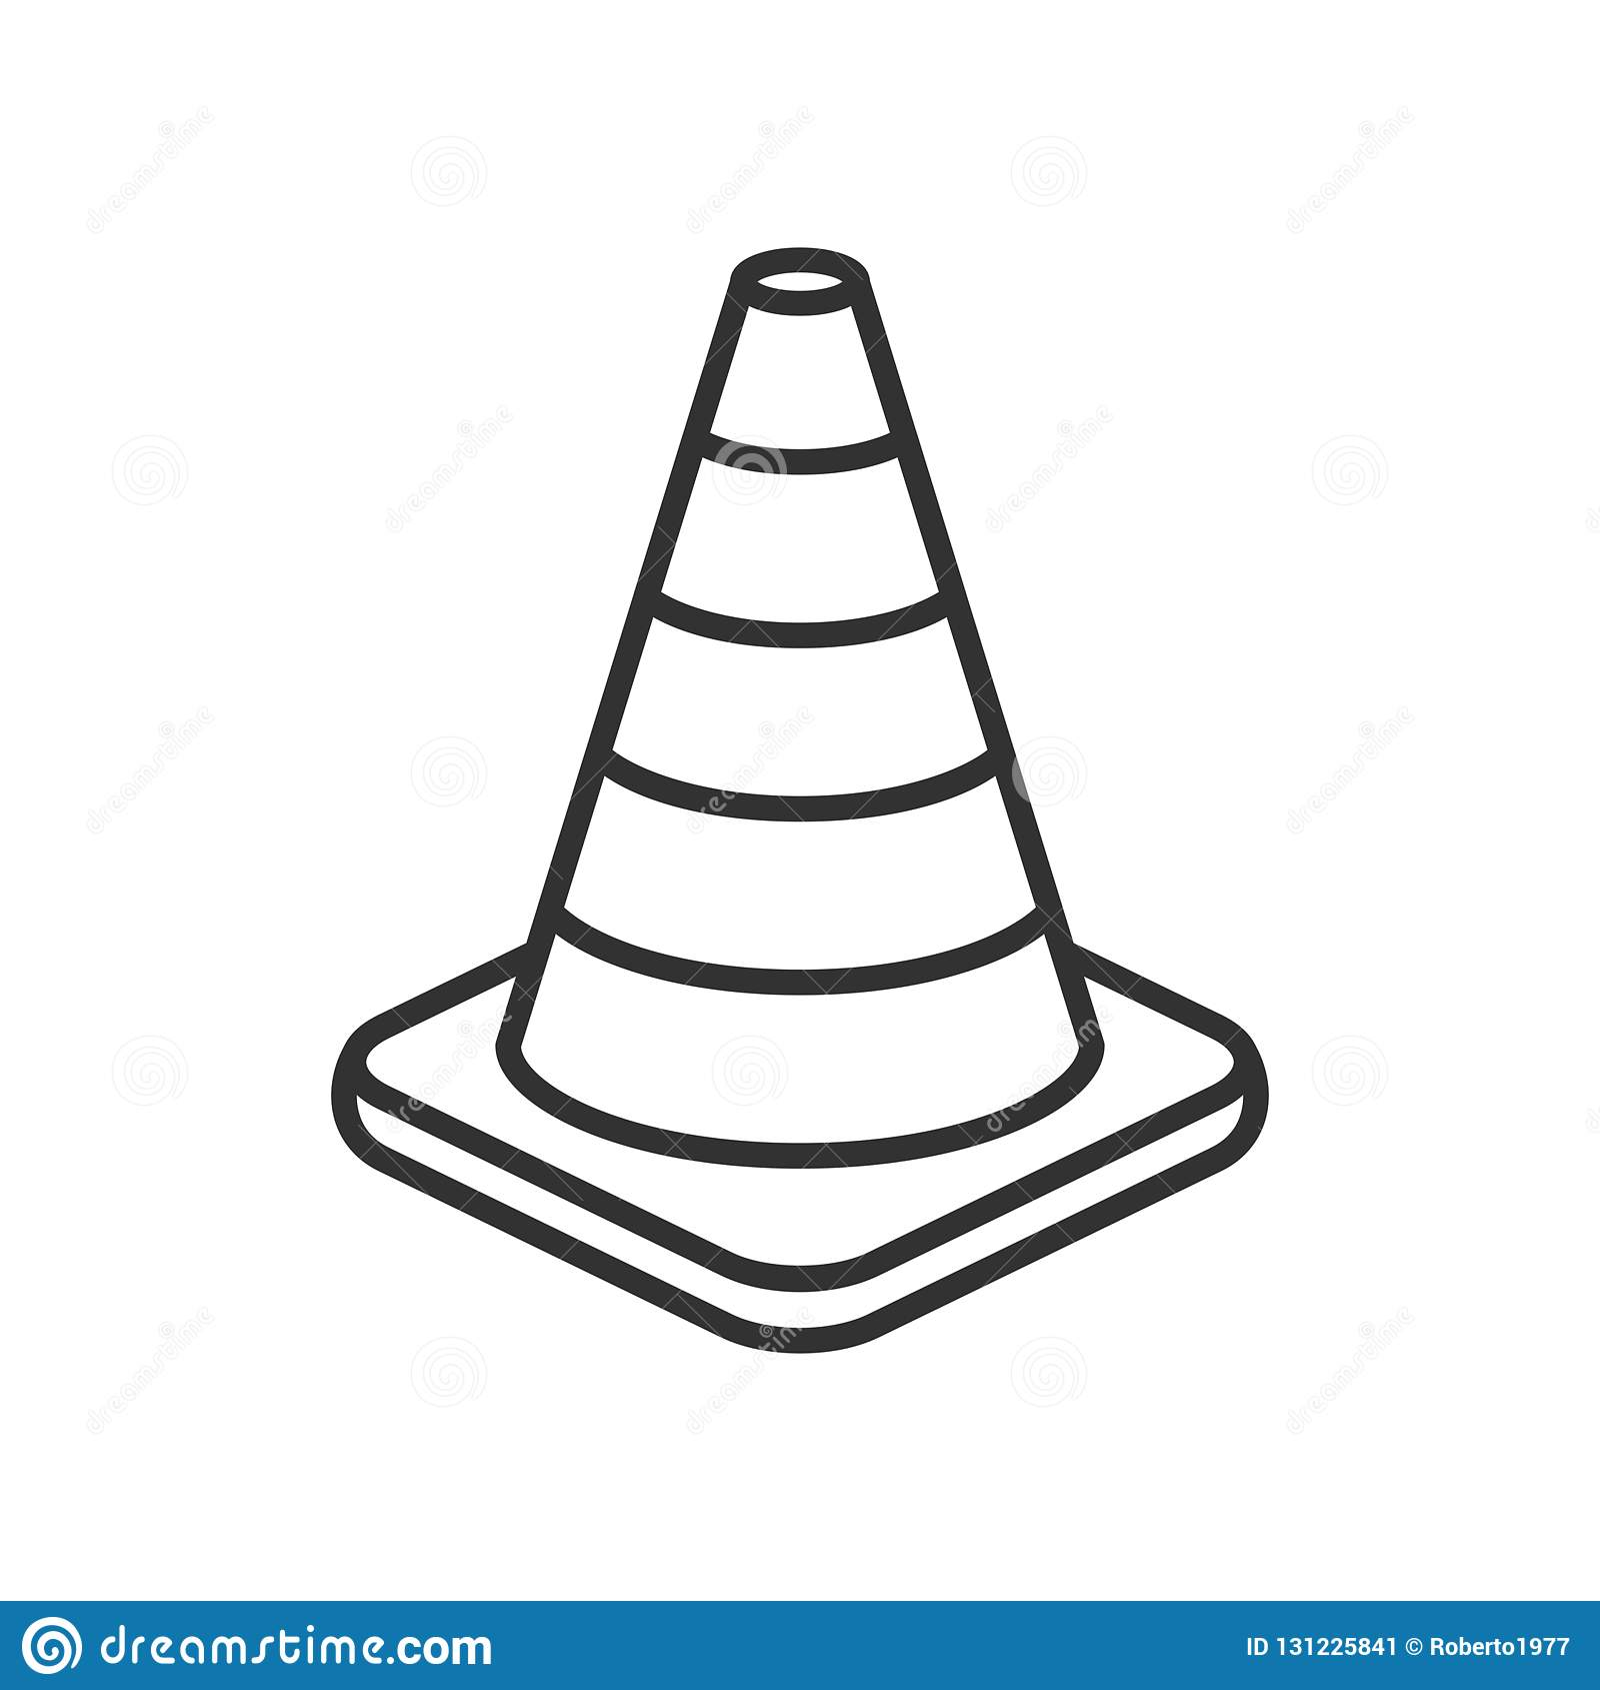 Verkehrs-Kegel-Entwurfs-flache Ikone auf Weiß